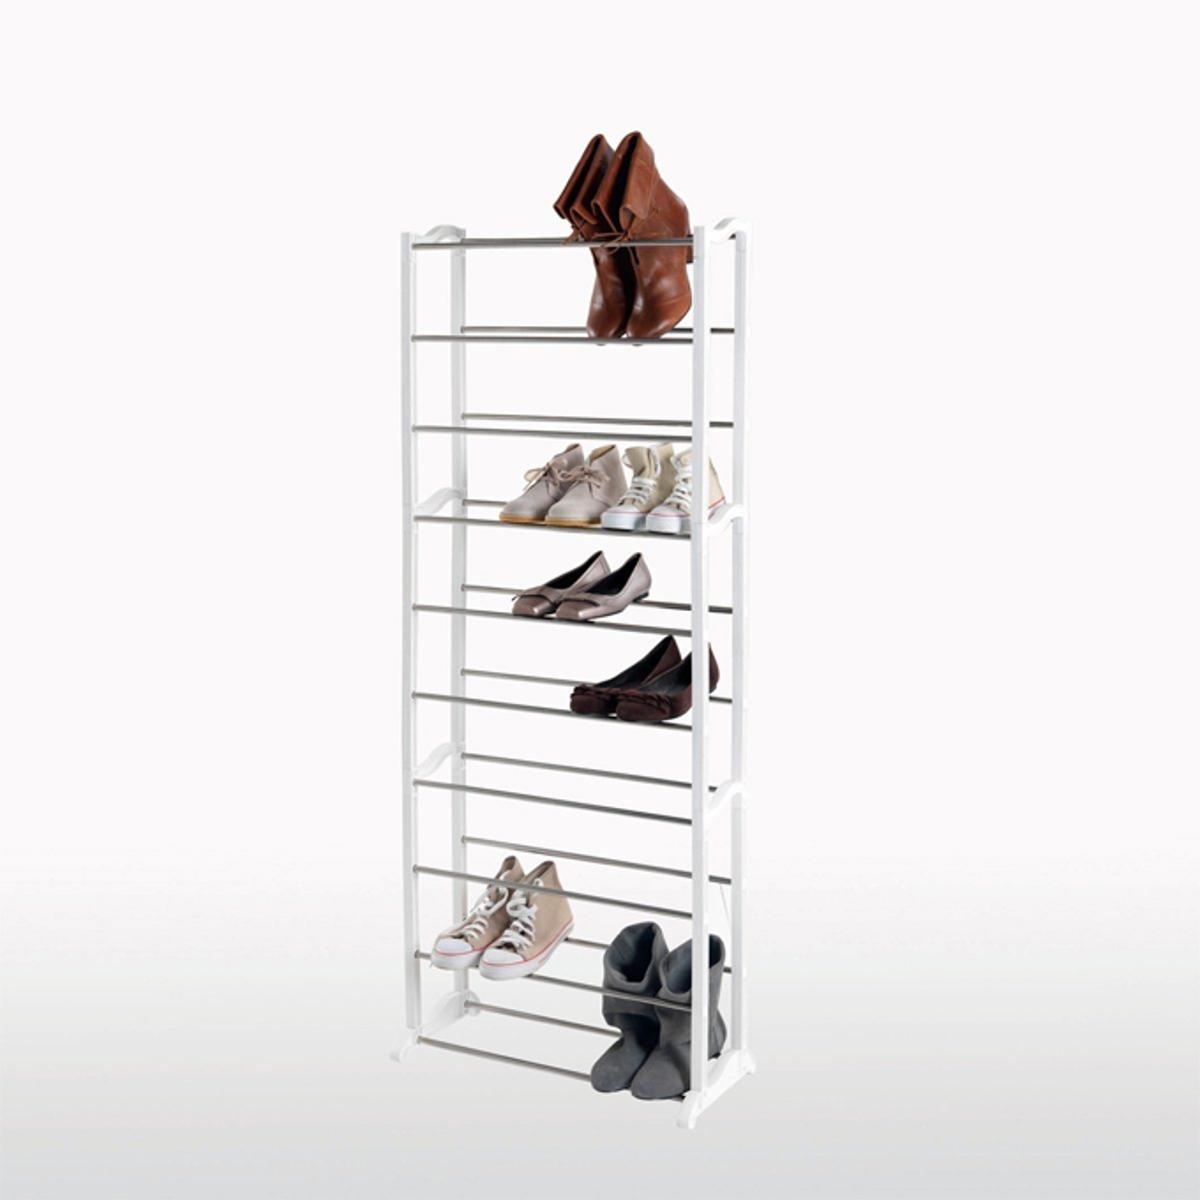 Полка модульная для обуви SCALLE от La Redoute